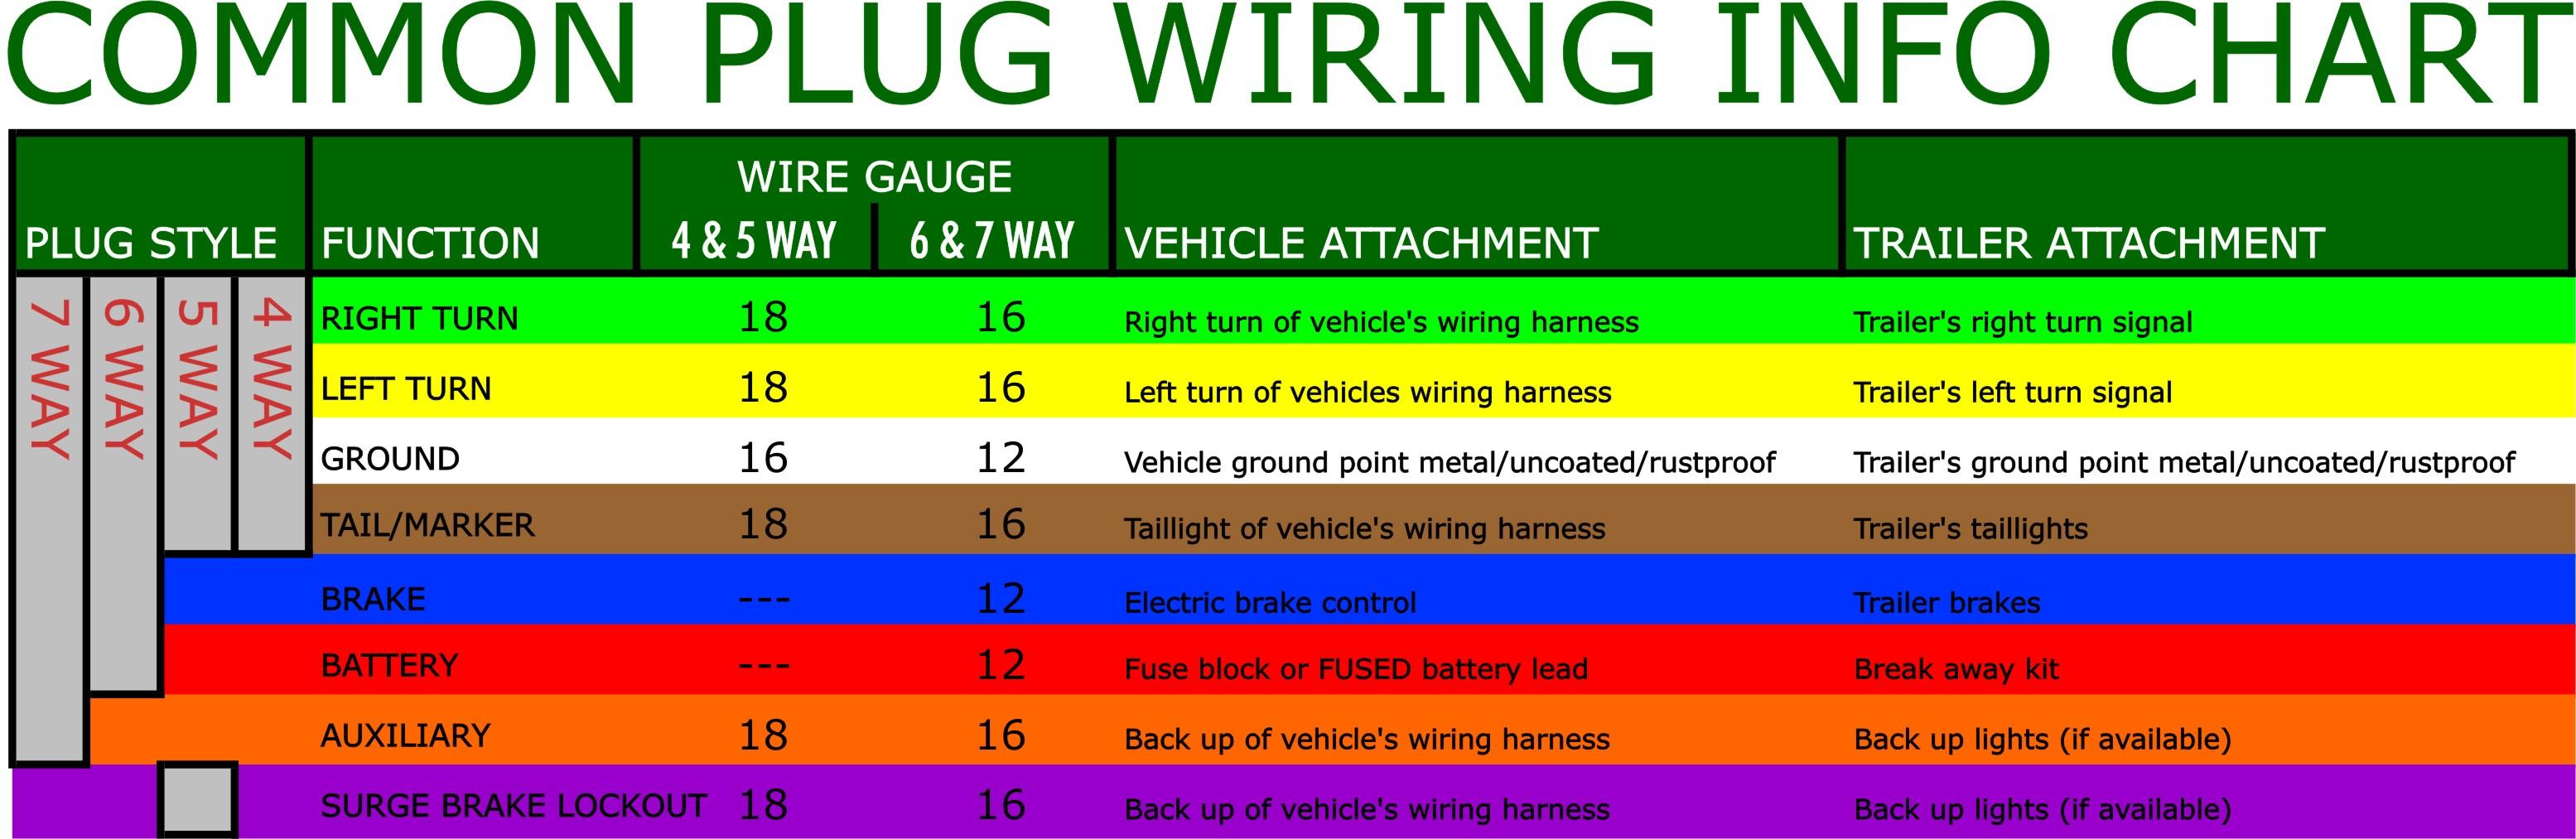 5 Pin Trailer Wiring Color Diagram - Wiring Diagram Detailed - 5 Wire Trailer Wiring Diagram